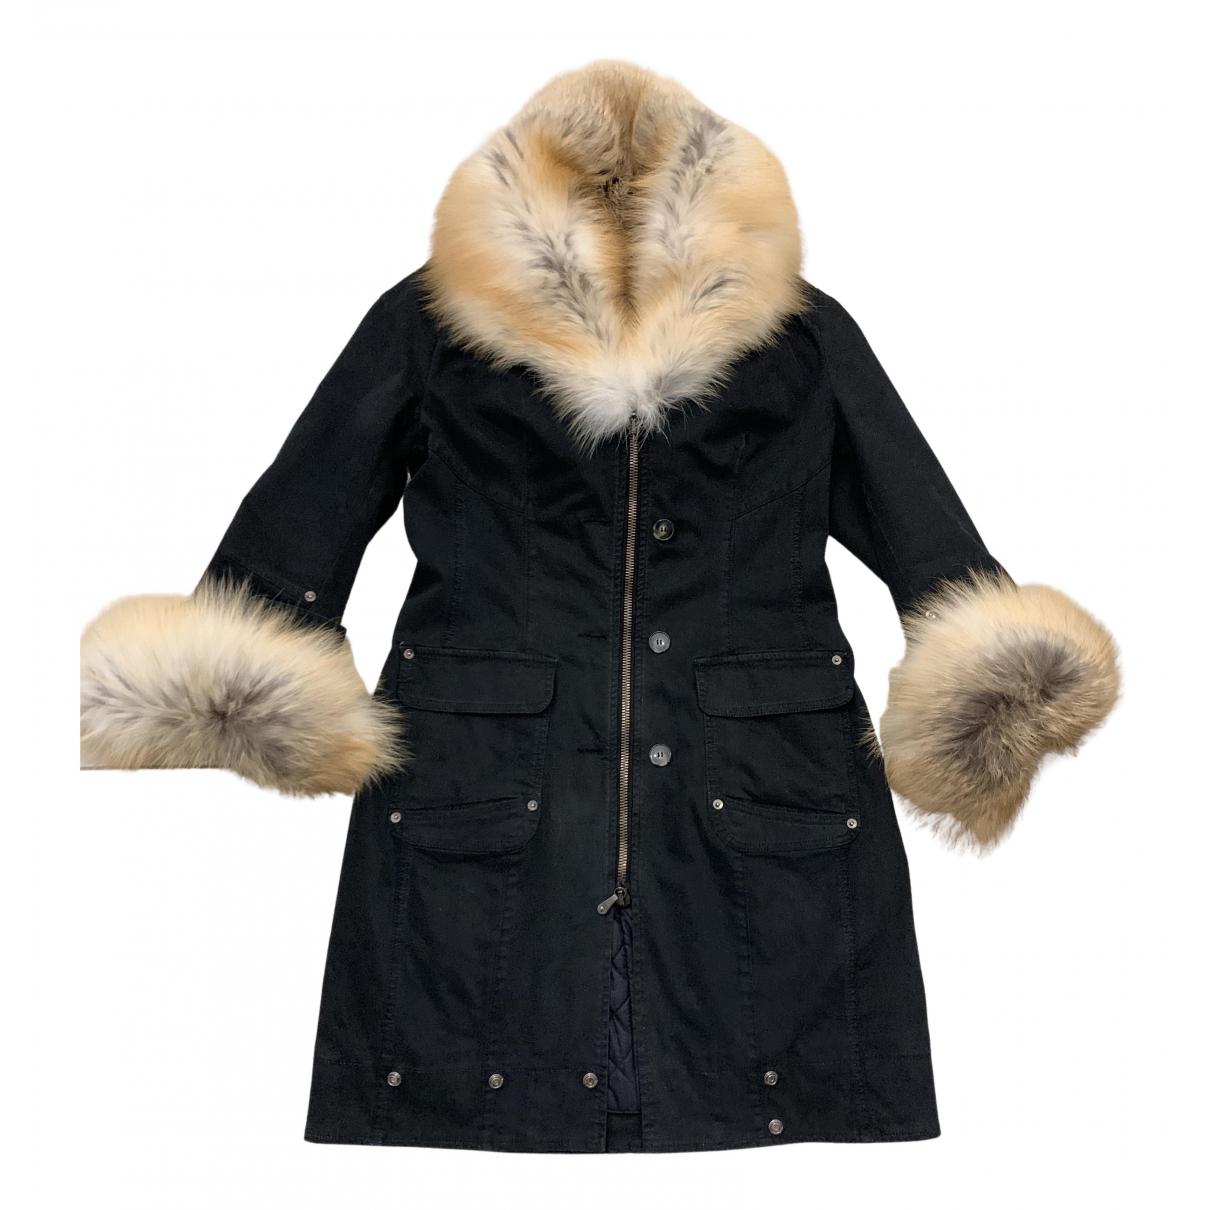 Ermanno Scervino N Black Cotton coat for Women 42 IT